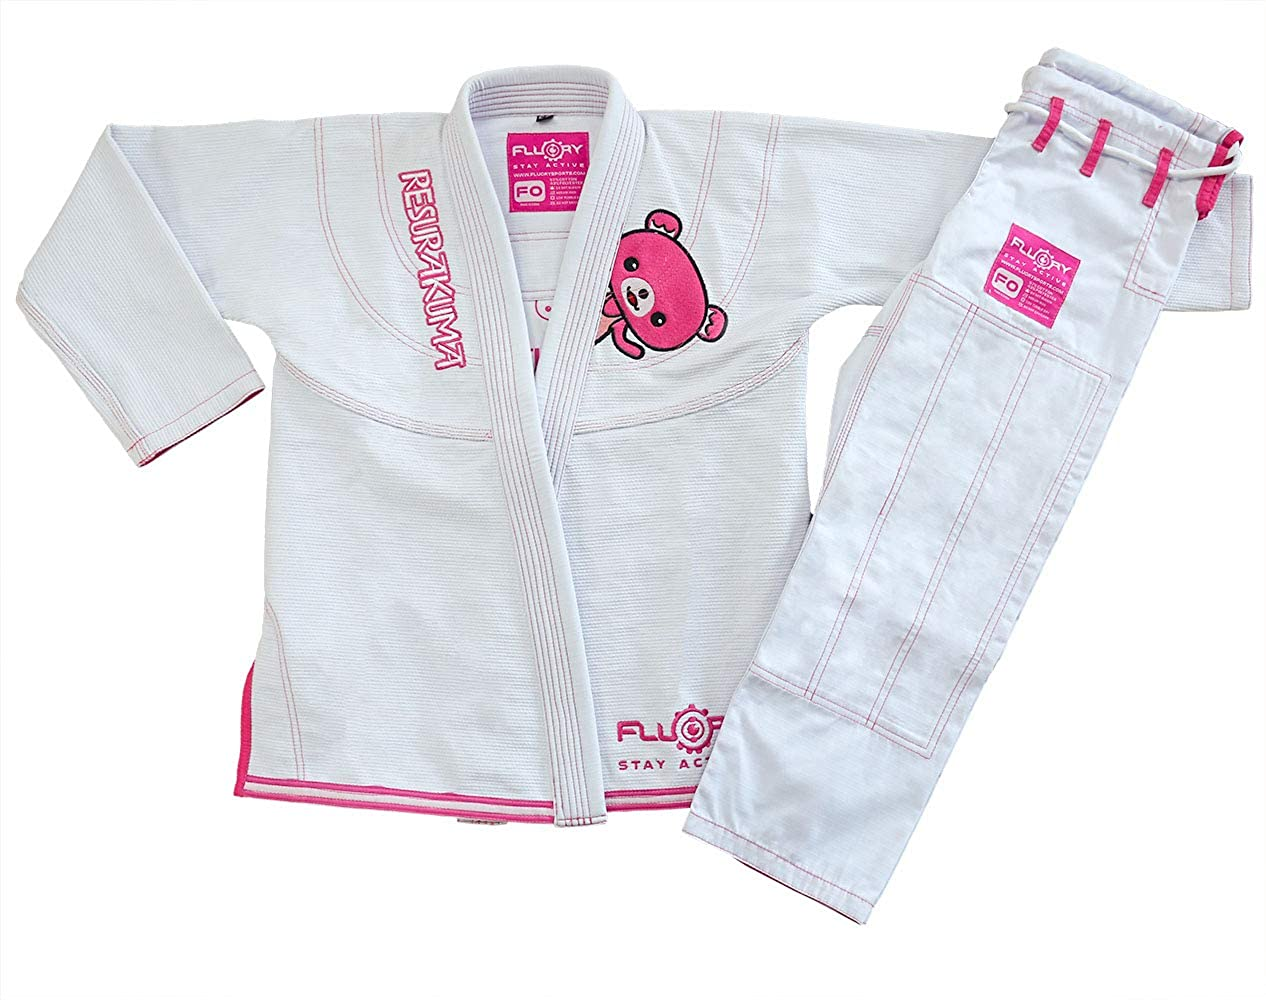 SunRise Ladies Brazilian Max 64% OFF Max 60% OFF Jiu Jitsu Suit BJJ Kimonos Female Gi W